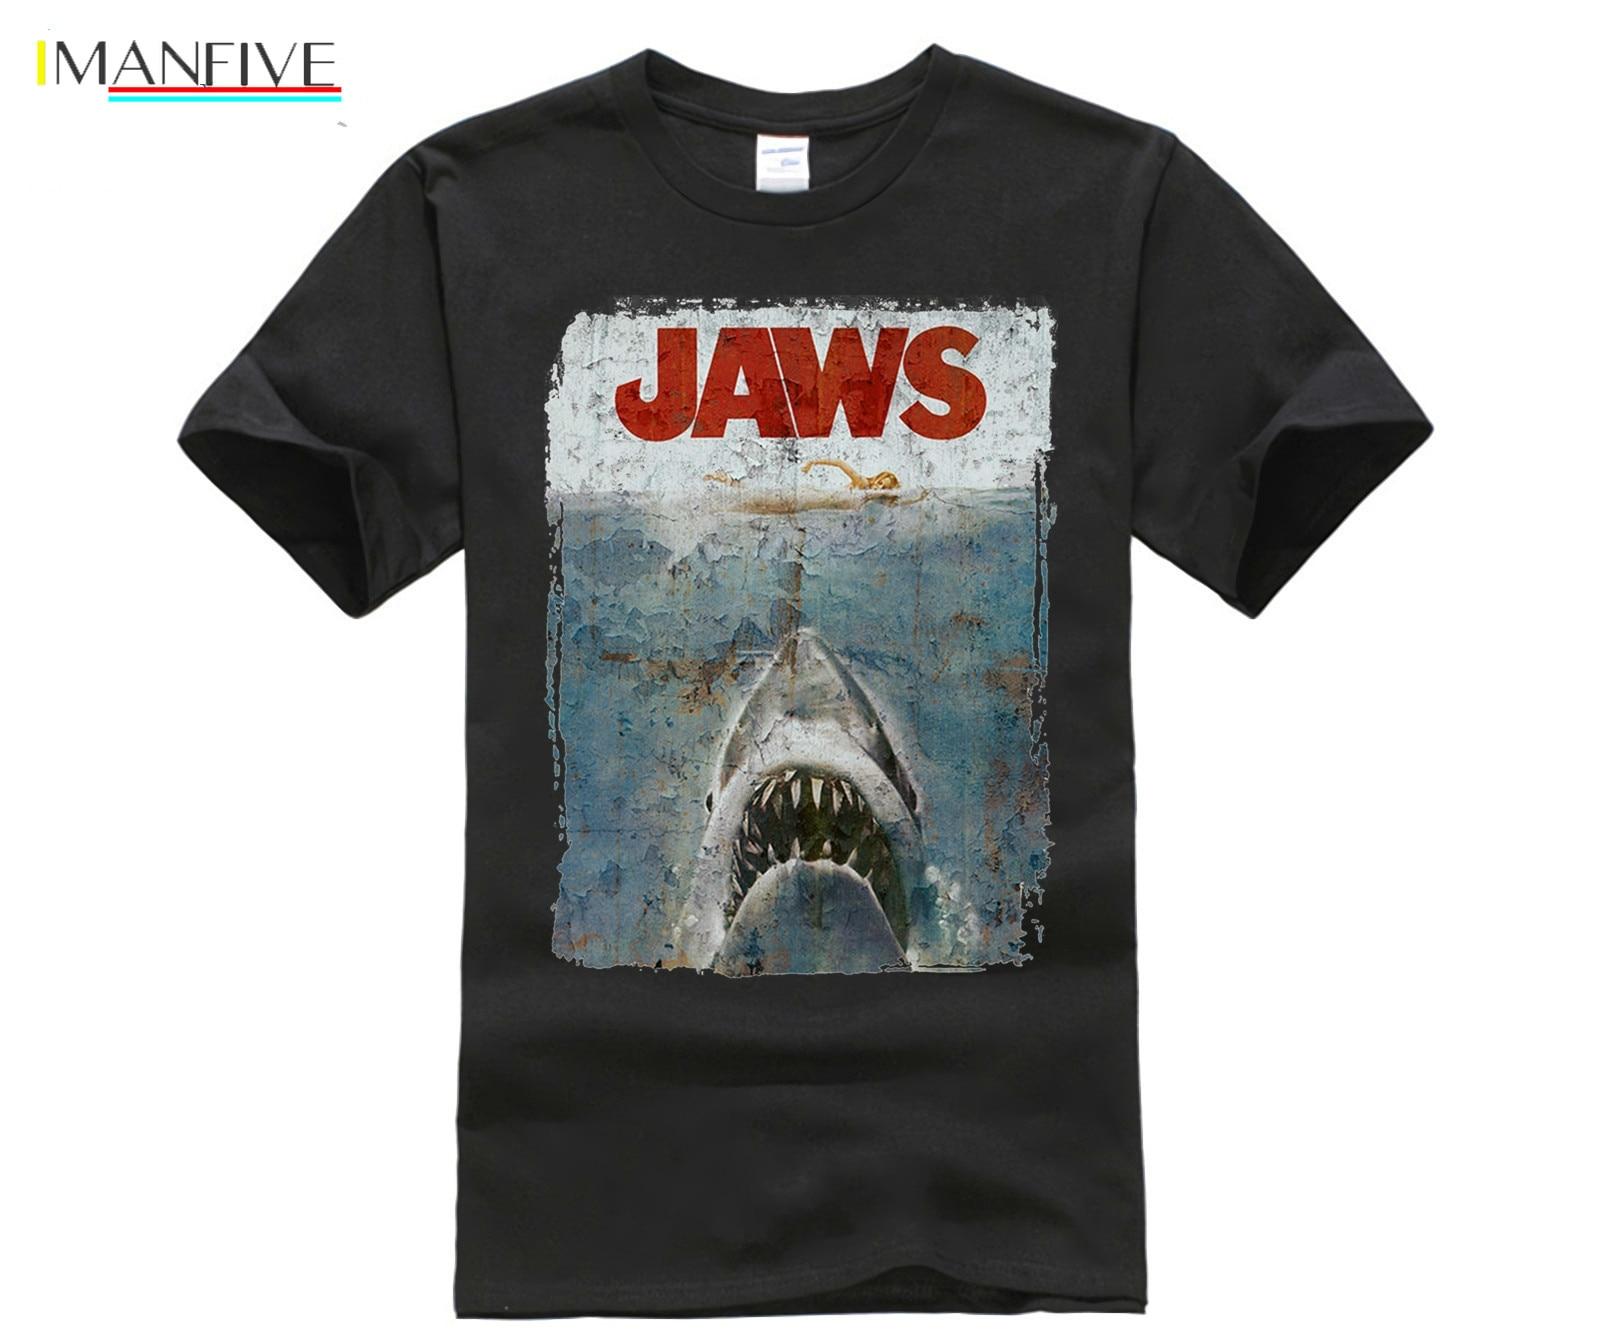 funny men cotton t shirt Men sporter t shirts JAWS DISTRESSED SPIELBERG RETRO MOVIE POSTER sporter t shirts in T Shirts from Men 39 s Clothing